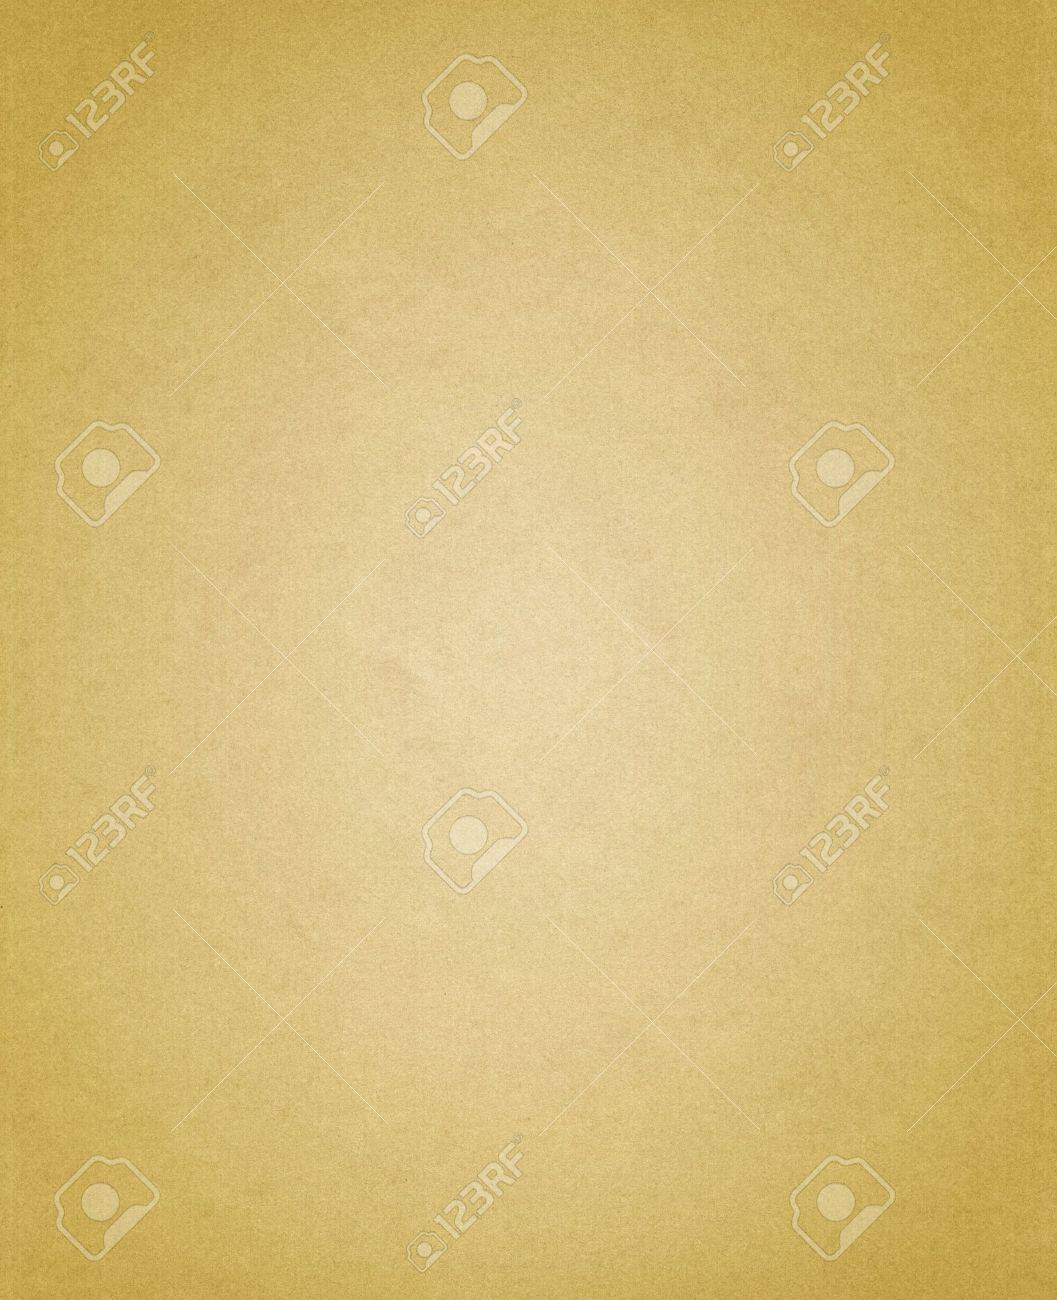 Yellow Plain Background Image Plain Yellow Background Pale